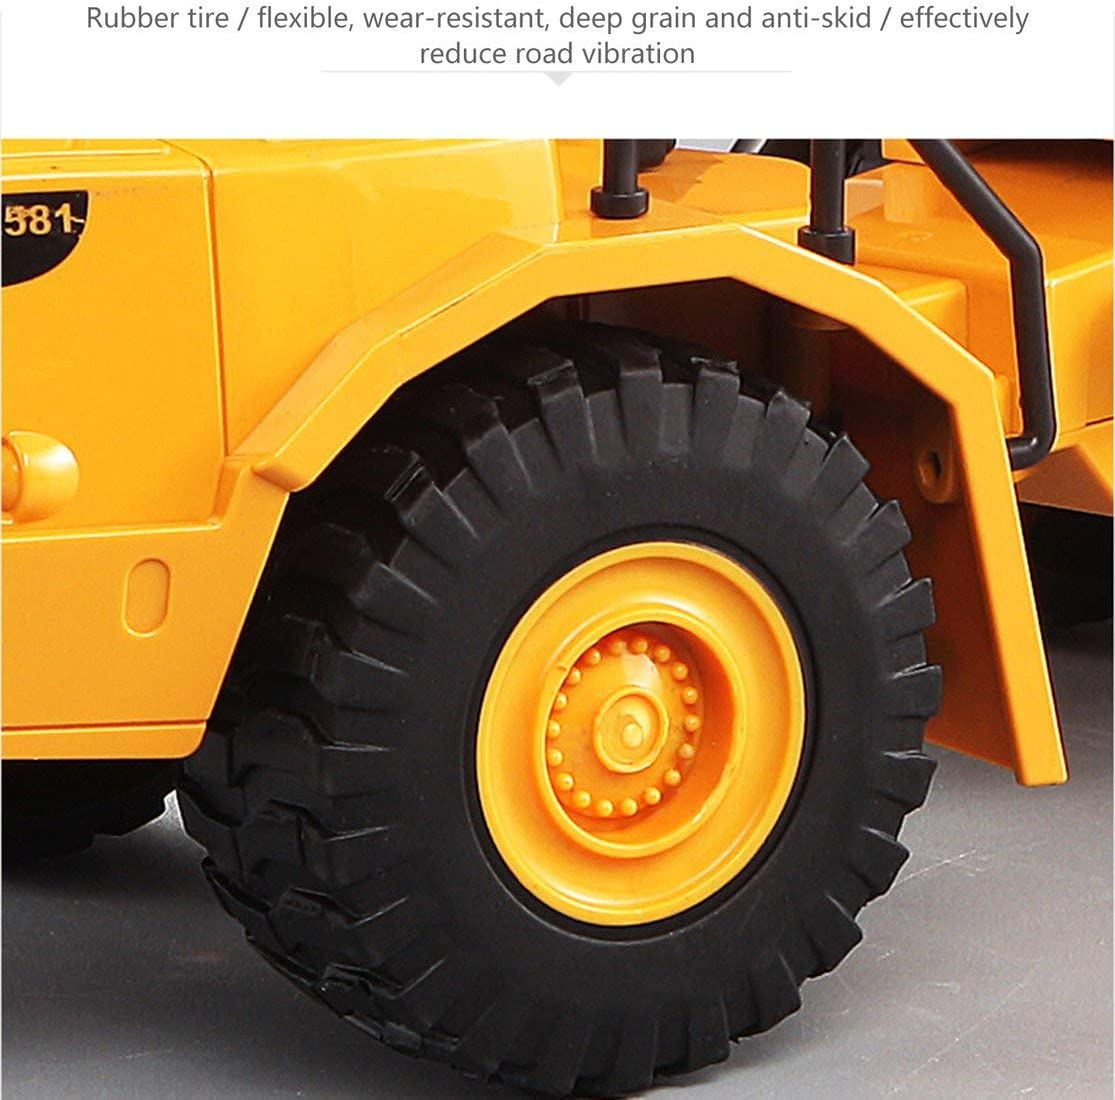 Kaemma RC Kipper-Modell 2,4 GHz Fernbedienung Dumper Spielzeug RC Engineering Autos Fahrzeuge neigbare Wagen E581-003